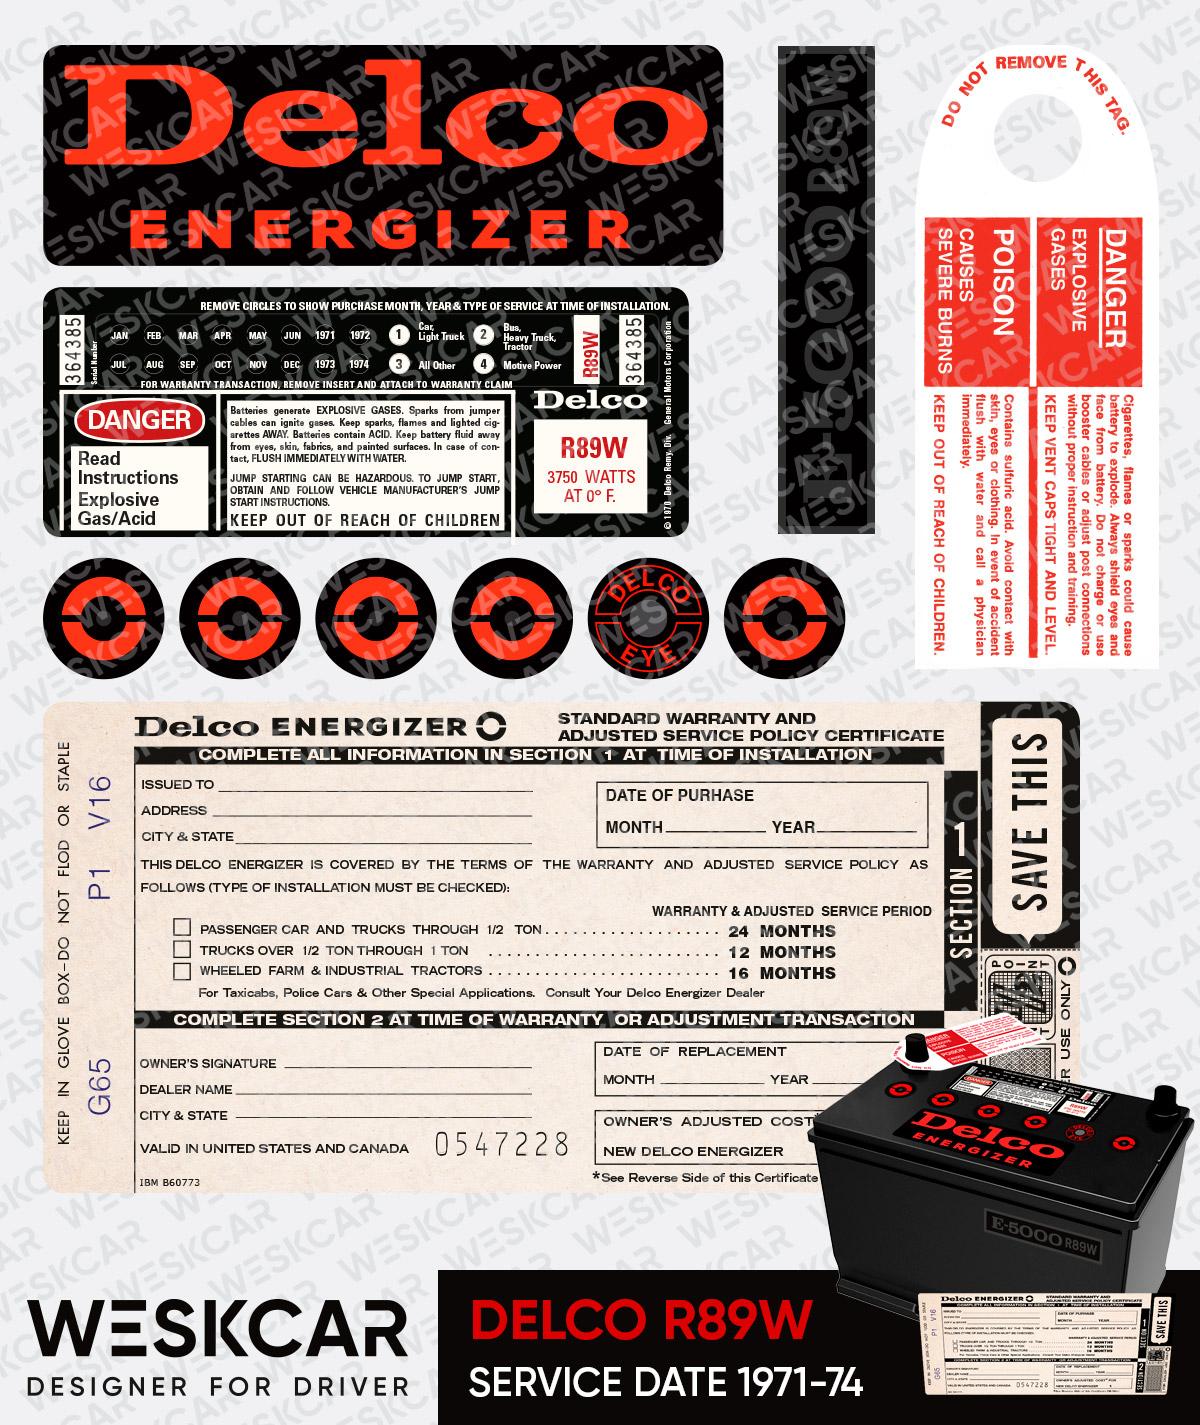 Delco Energizer Battery DC-7 Sticker kit